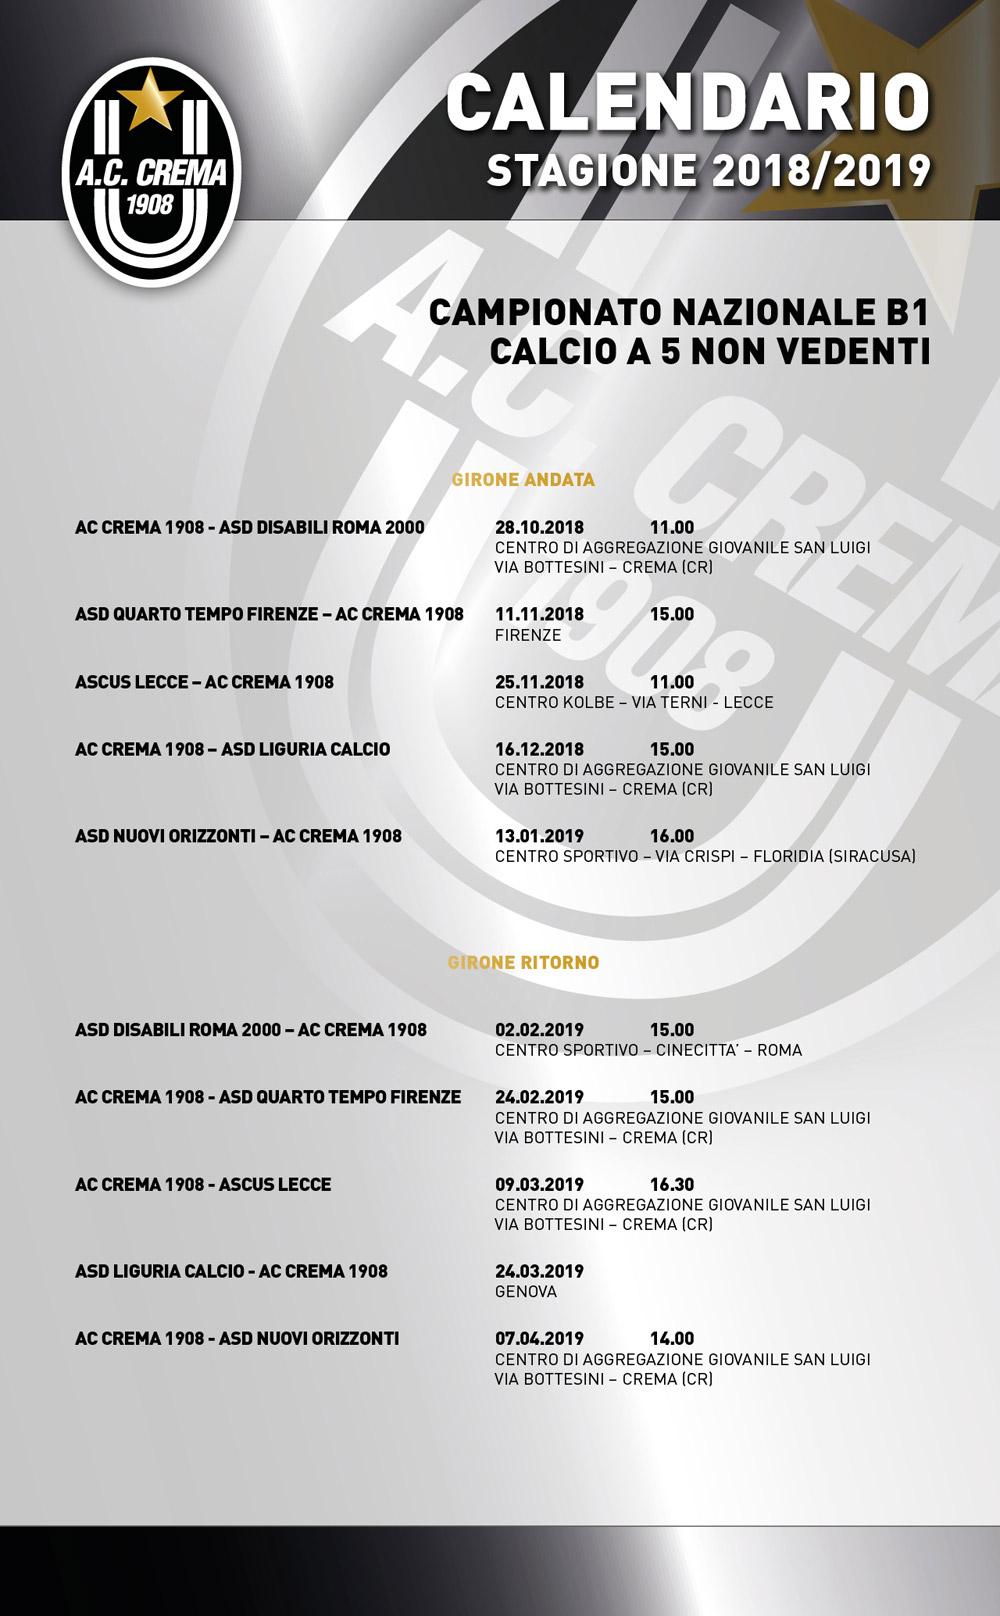 Calendario-nonvedenti-1819-1000